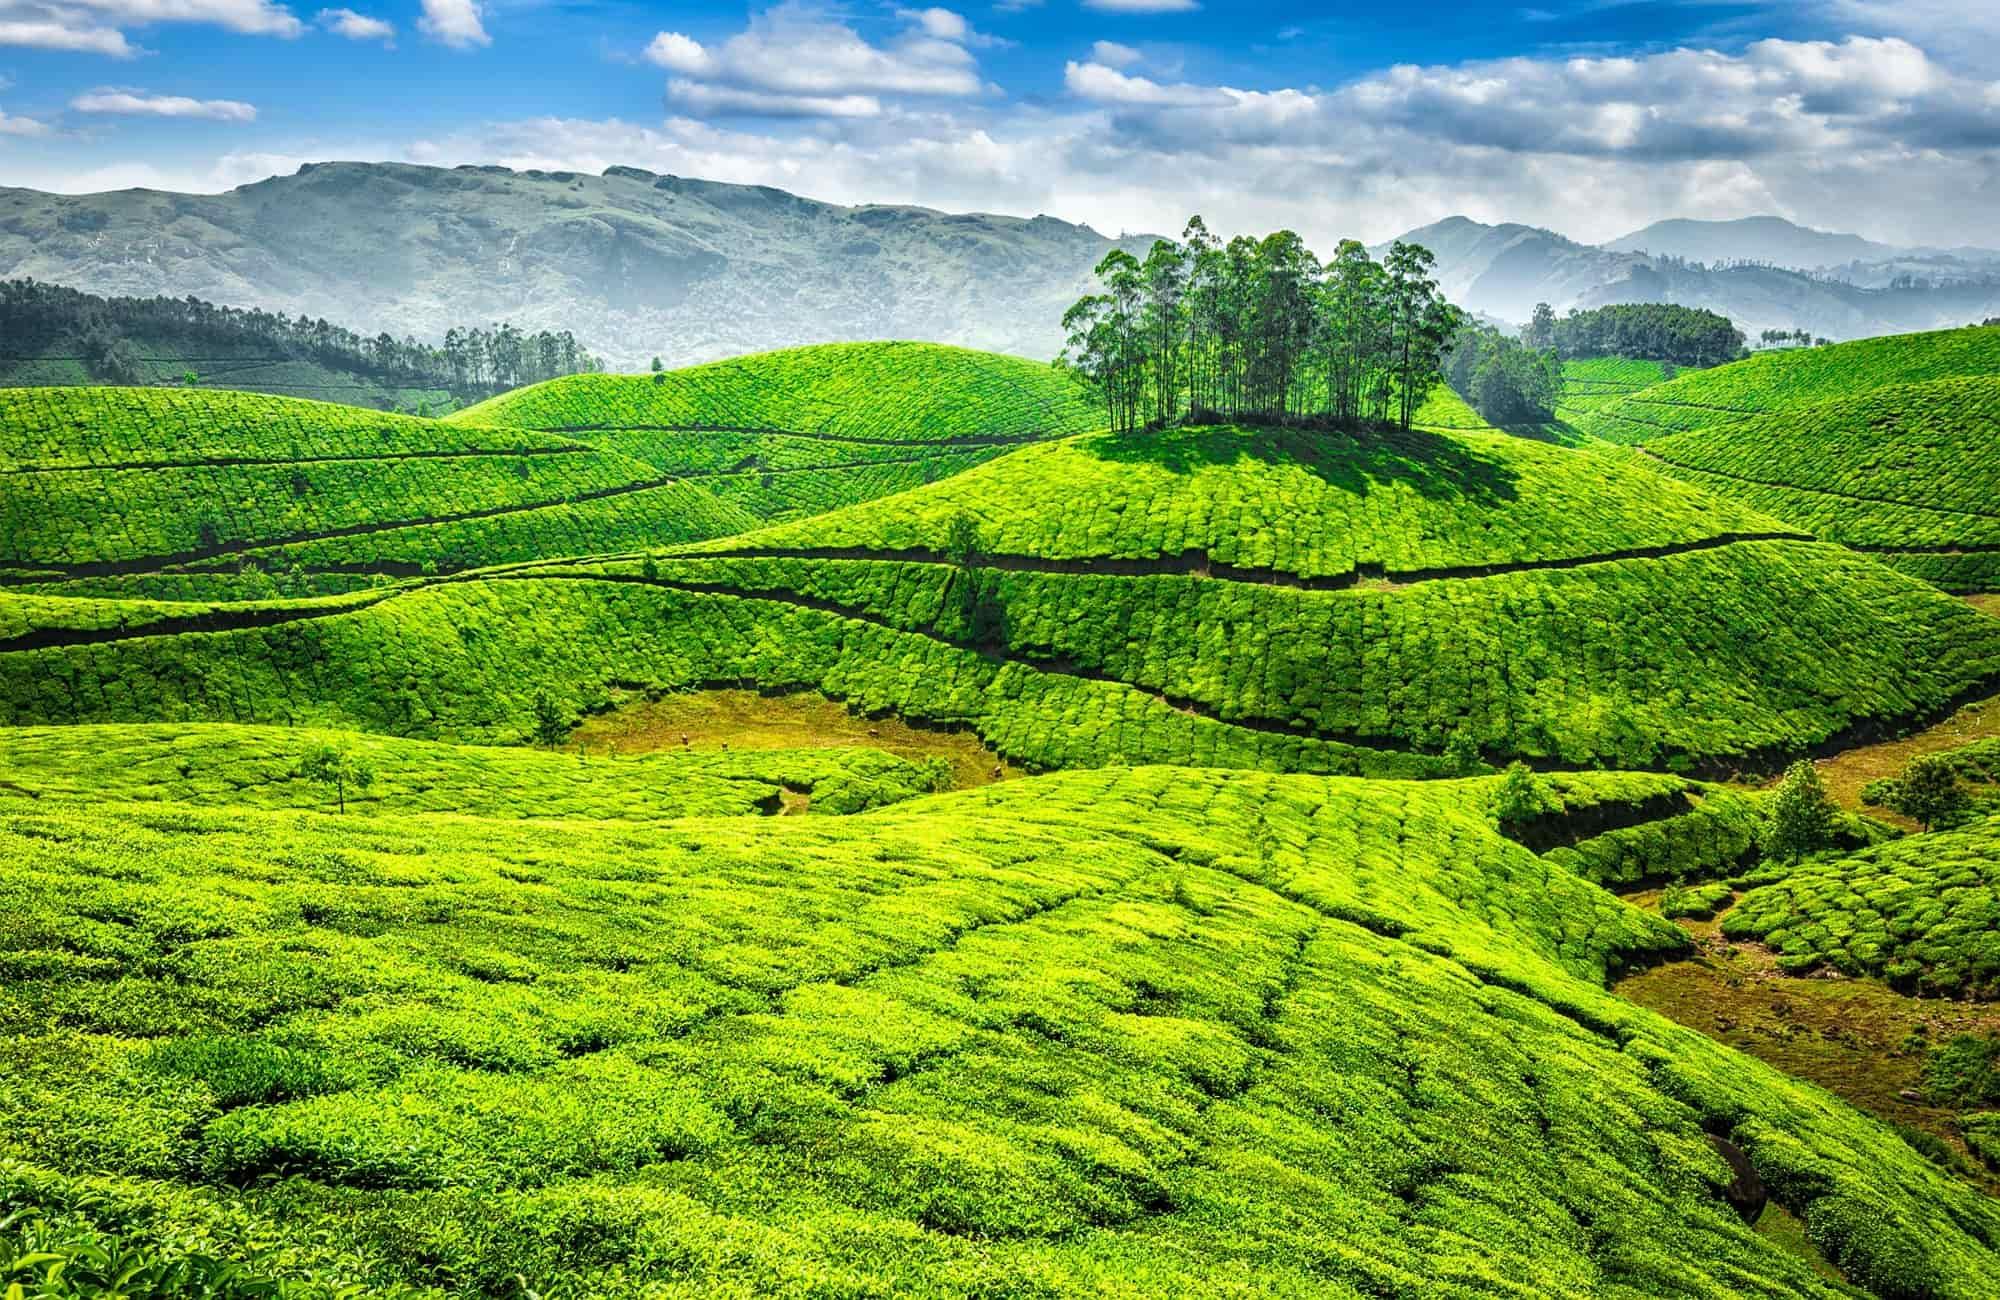 Voyage au Kerala - Munnar - Amplitudes